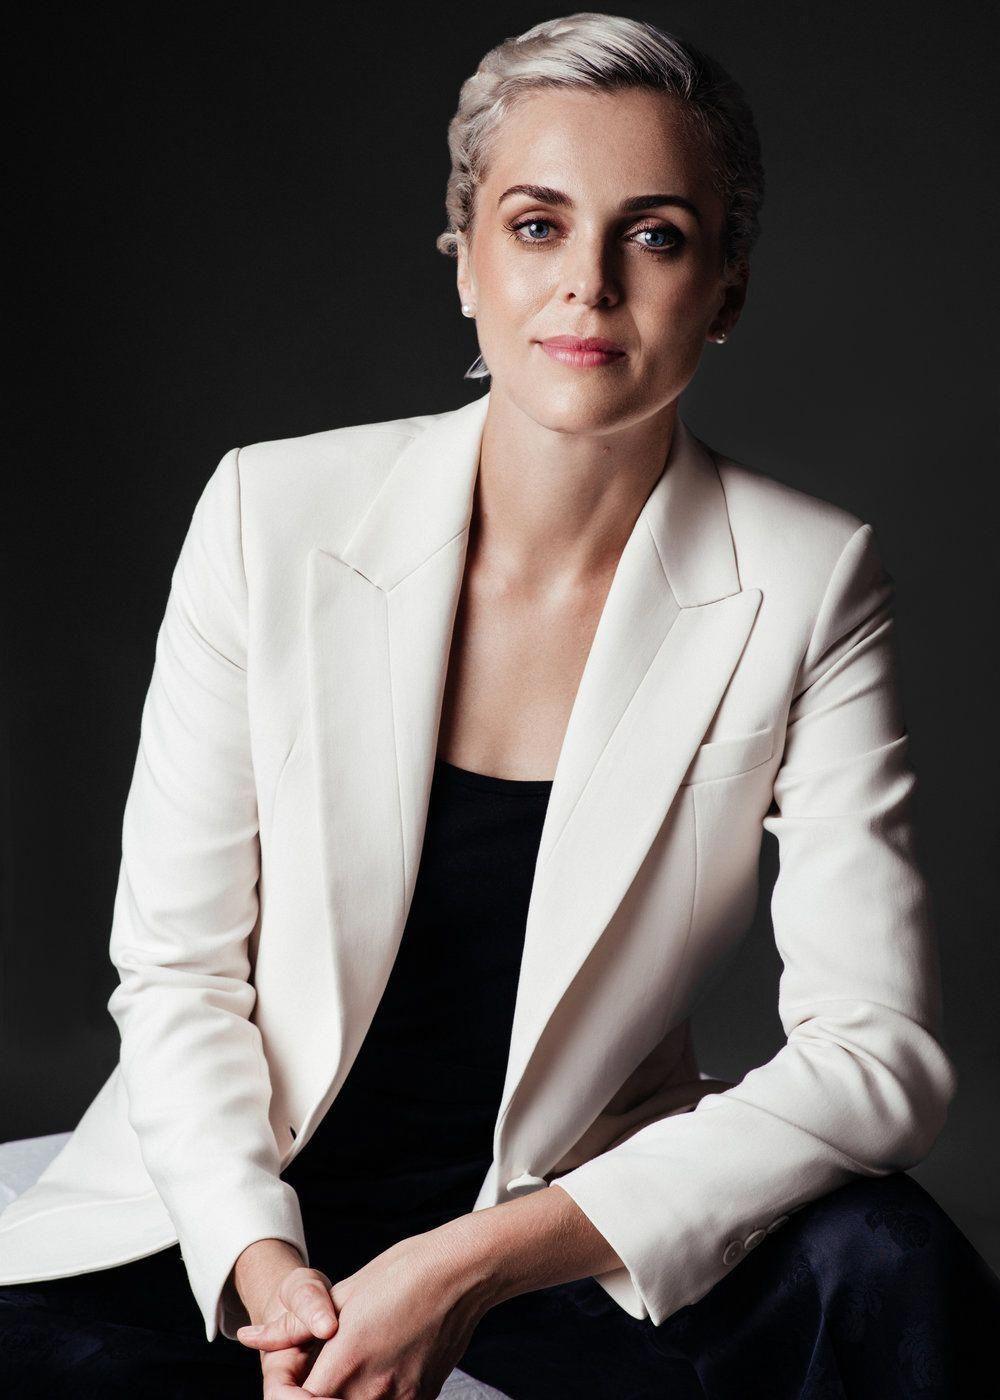 Corporate headshots for women by ceo portrait female